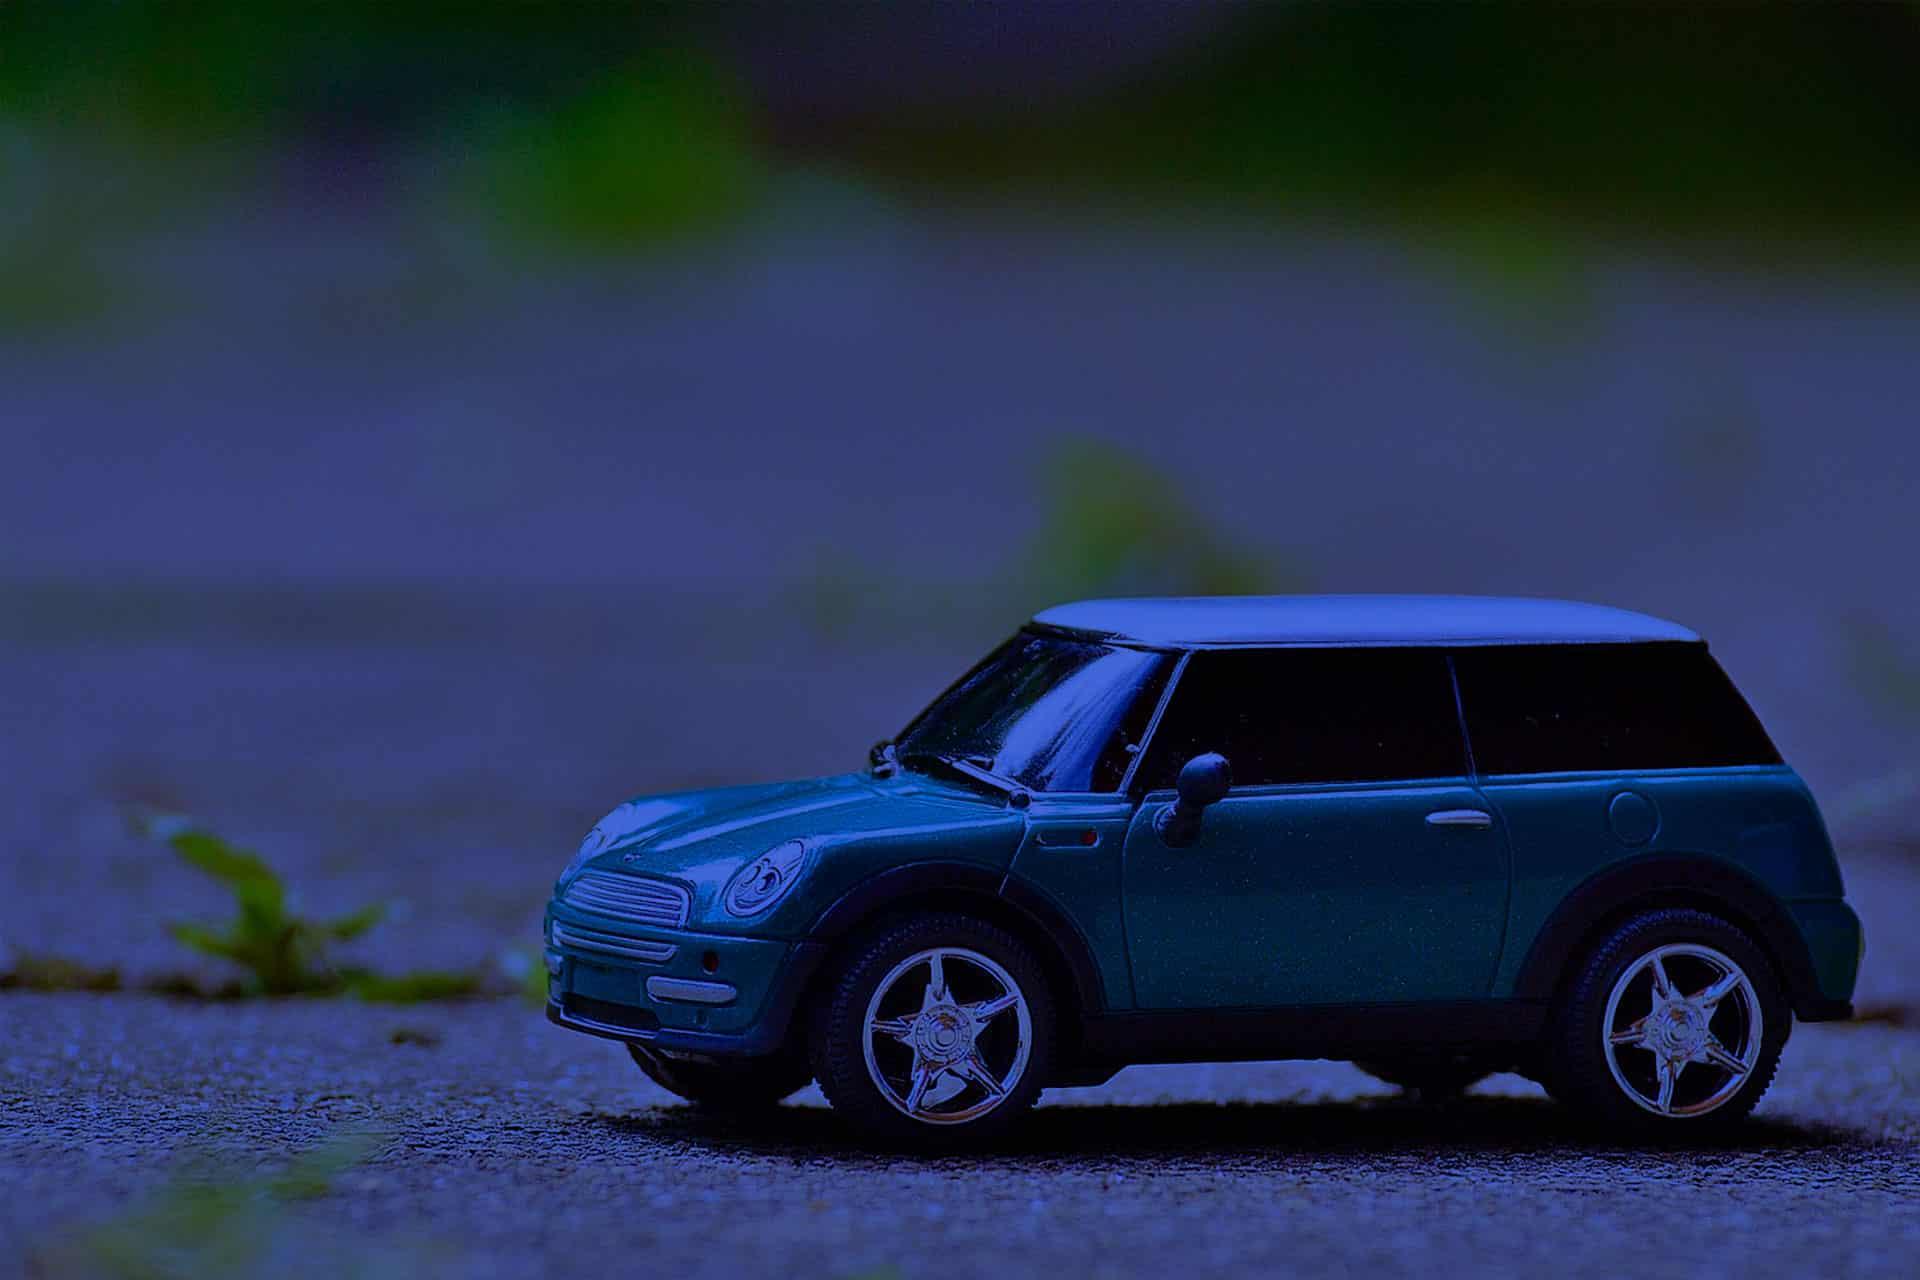 Imagen de una miniatura de un cochecito